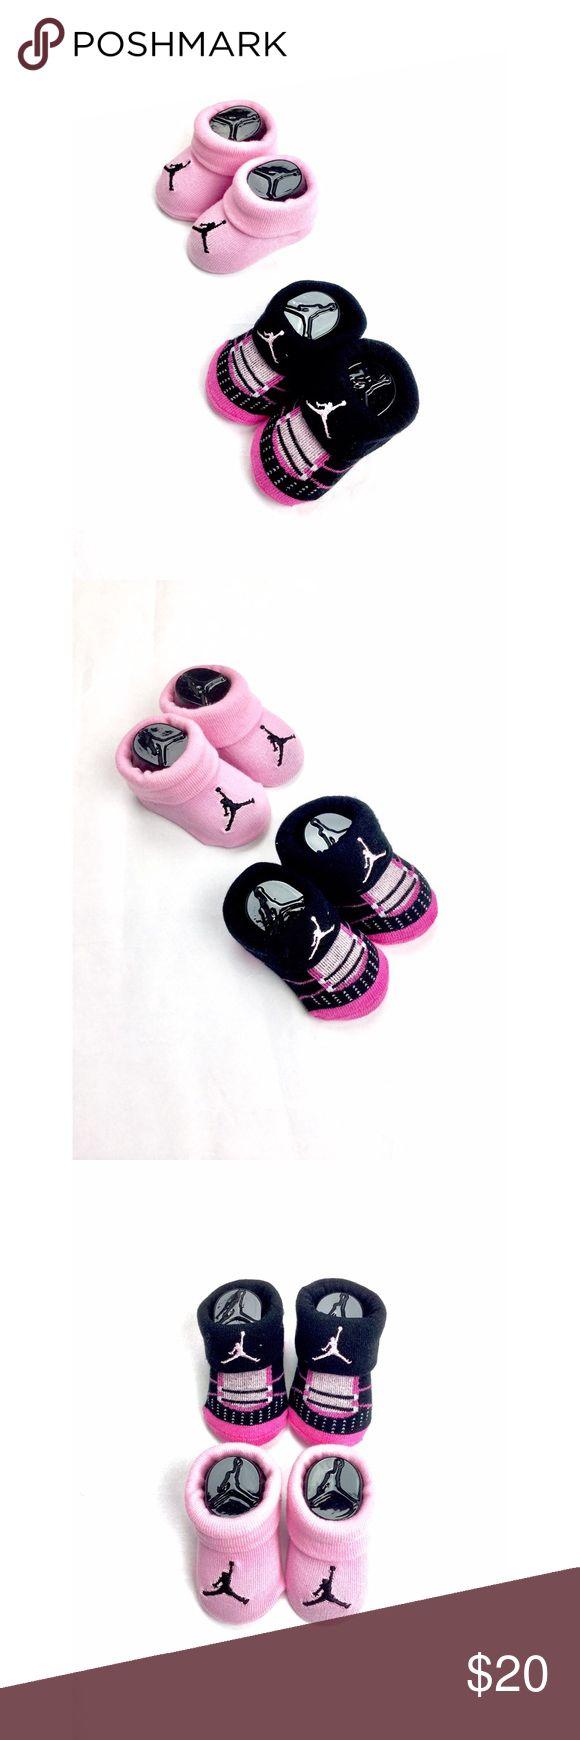 Infant Girl Jordan Socks Two Pair Set Cute infant baby girl Jordan socks.  One pair is pink with black logo and second pair is black with pink logo.  NWOT. Never worn. Jordan Accessories Socks & Tights